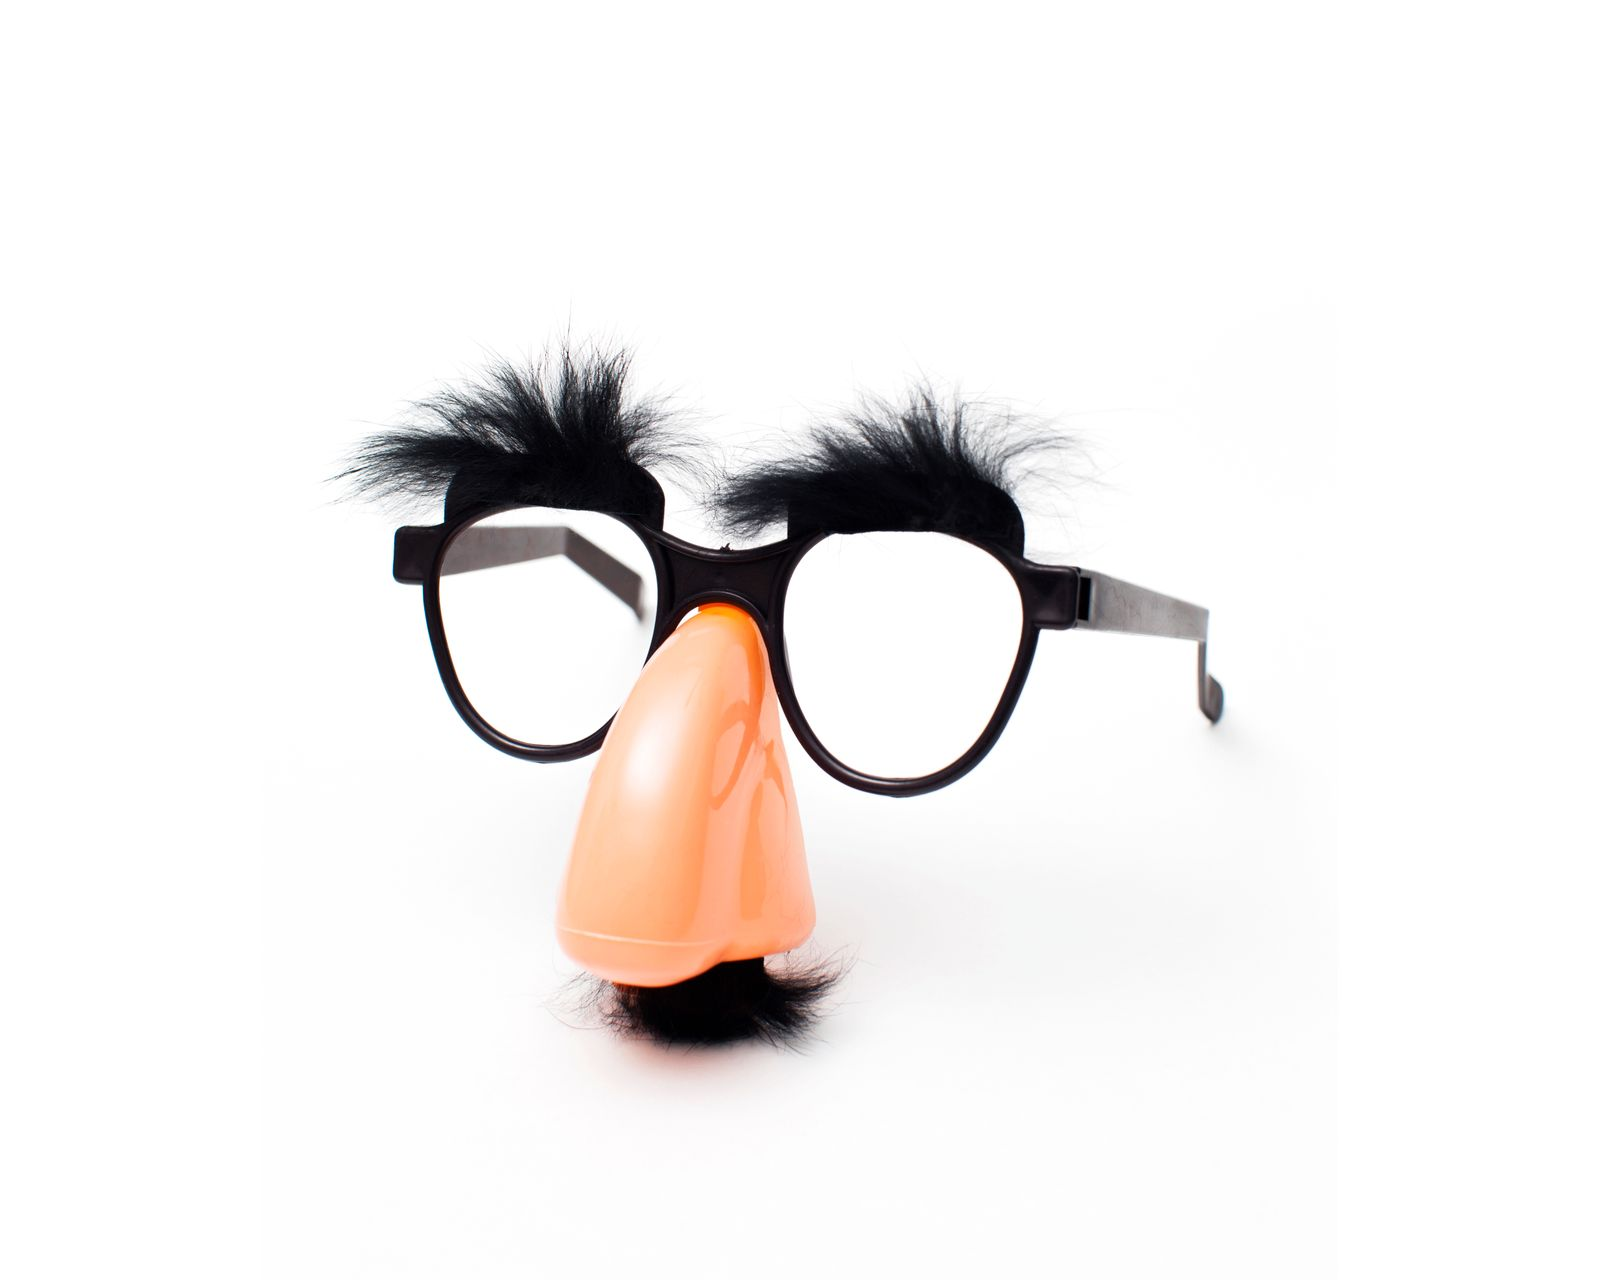 Groucho Marx novelty glasses on a white background